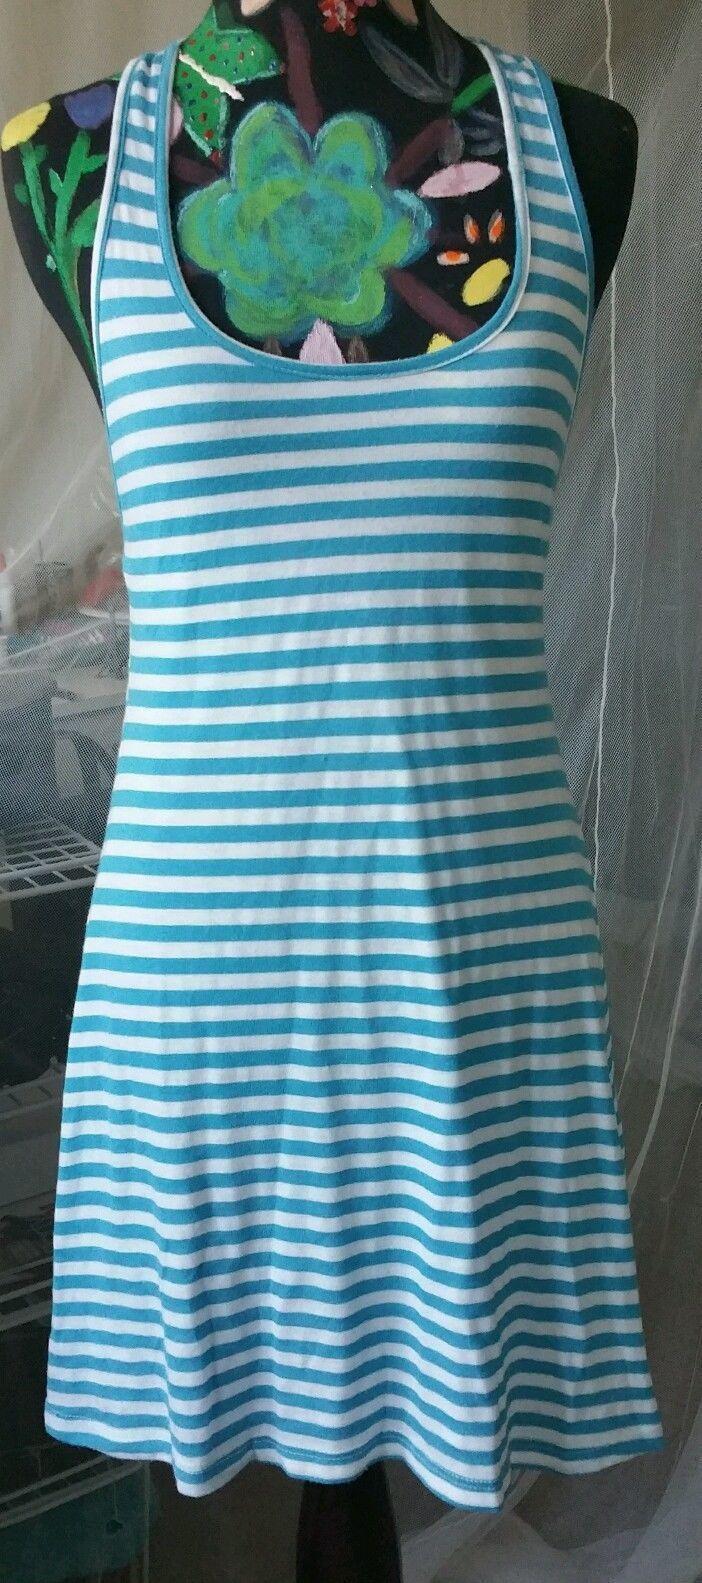 Light Blue T Back Dress Striped White Knee Length Roses Down The T New Size